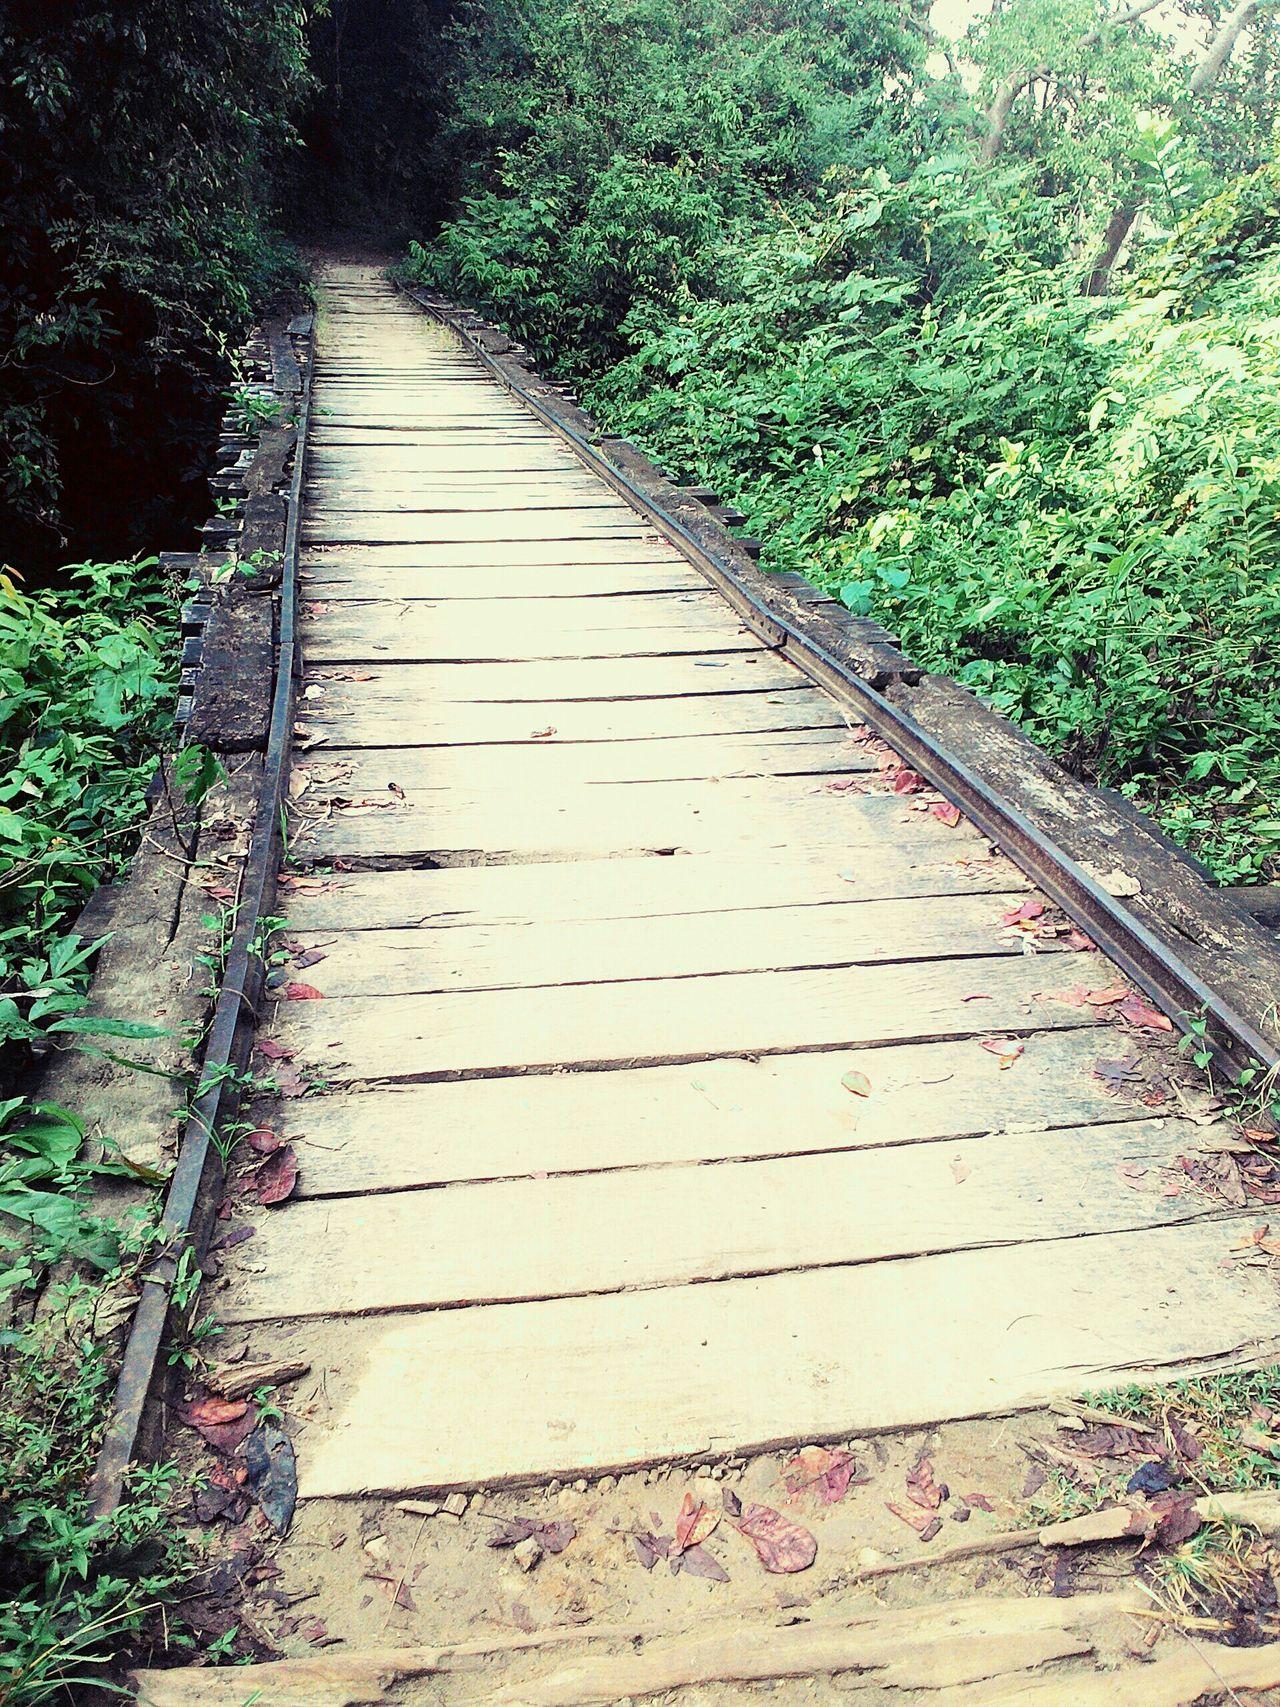 Way to cinet ......Bridge